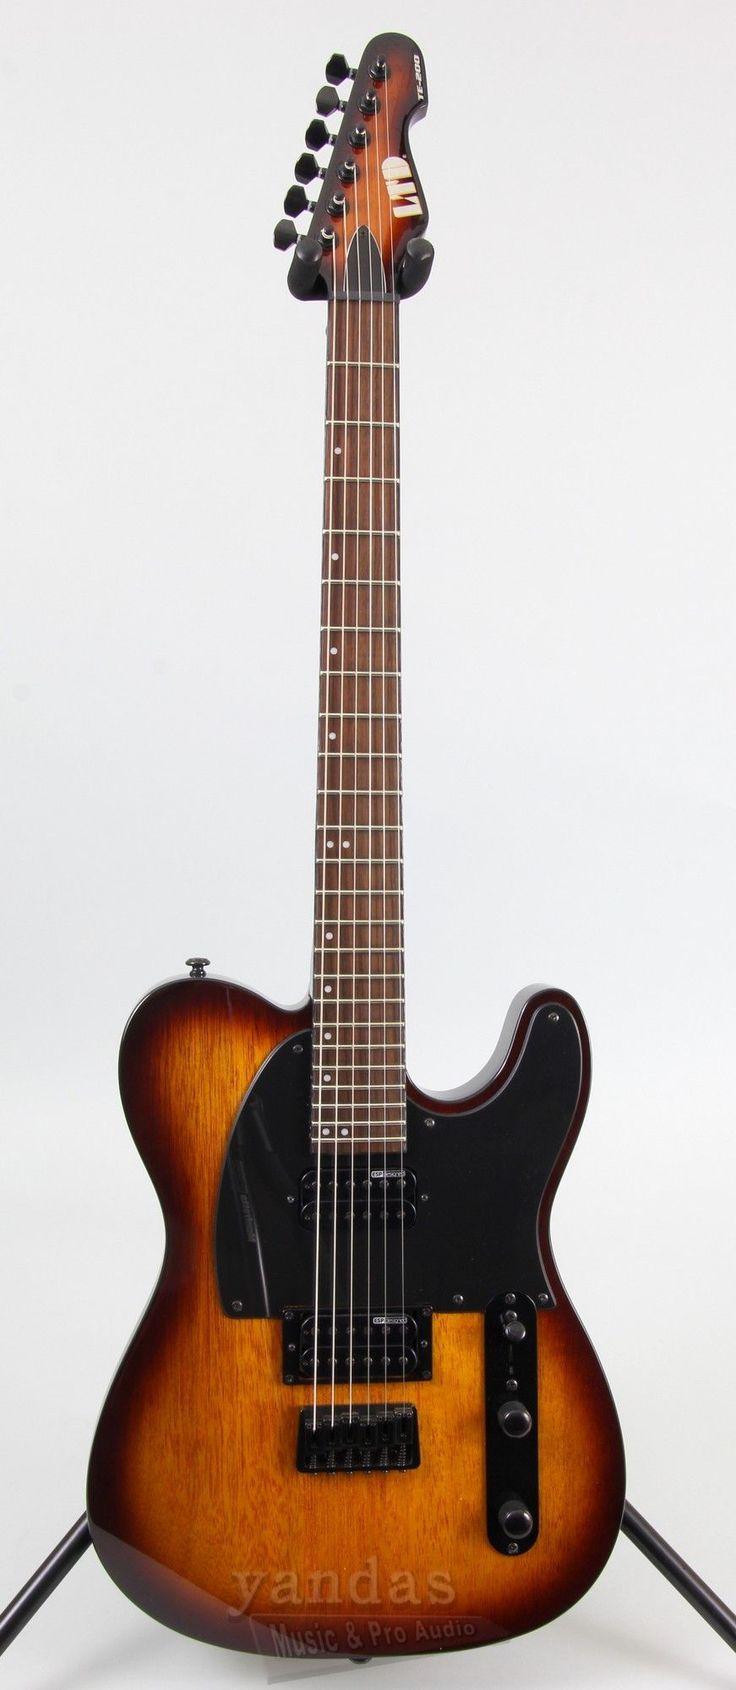 LTD TE-200 Features - 25.5 Scale Length - Mahognay Body - Bolt-On 3-Piece Maple Neck - 350mm Radius - ESP Designed Humbuckeres - 24 XJ Frets - Thin U Neck Contour - Black Hardware Finish Options - Bl www.guitaristica.org #electricguitar #guitars #guitaristica